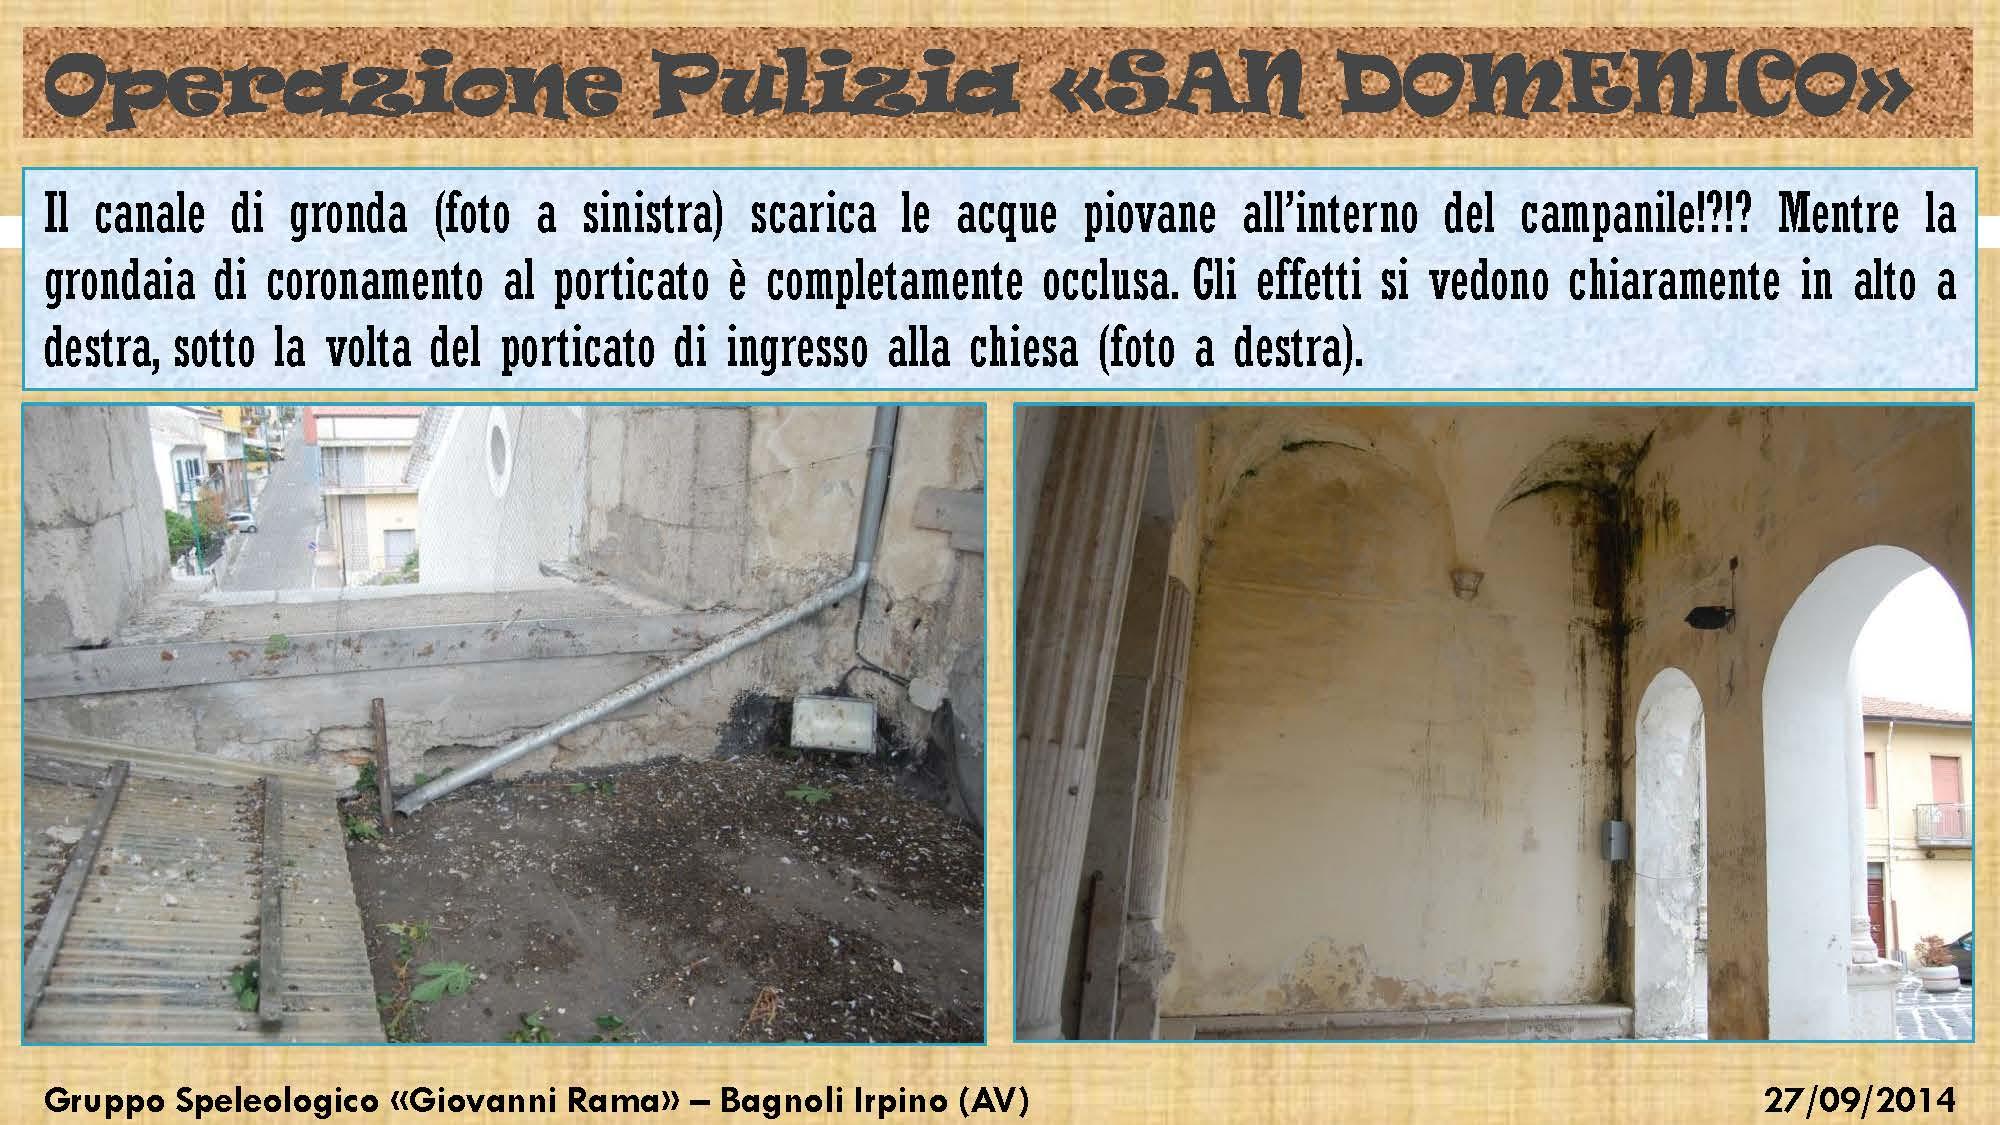 Bagnoli-Pulizia-San-Domenico-2014_Pagina_18